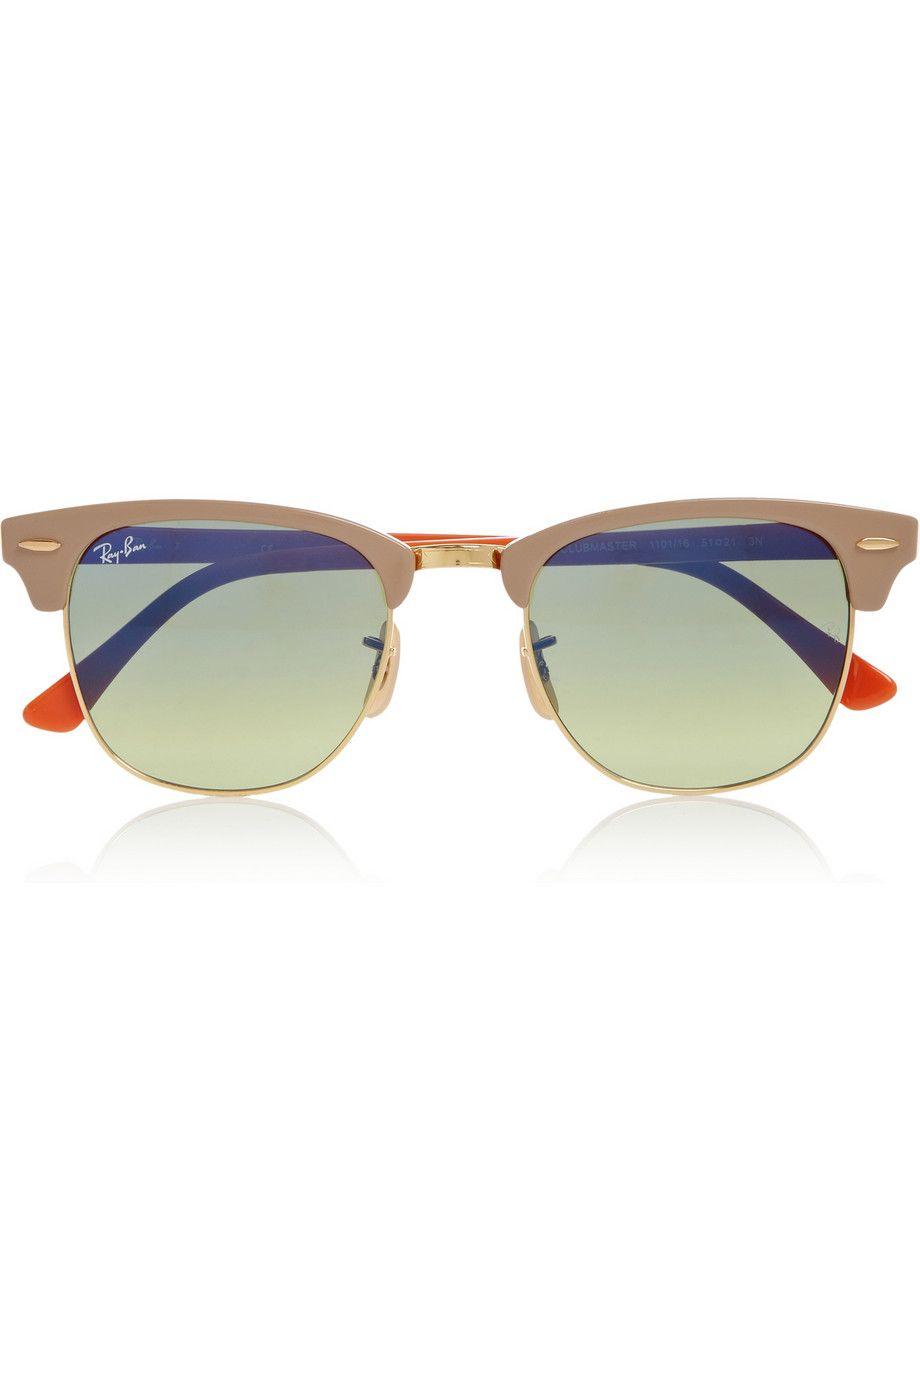 Ray-Ban | Clubmaster half-frame acetate sunglasses | NET-A-PORTER ...